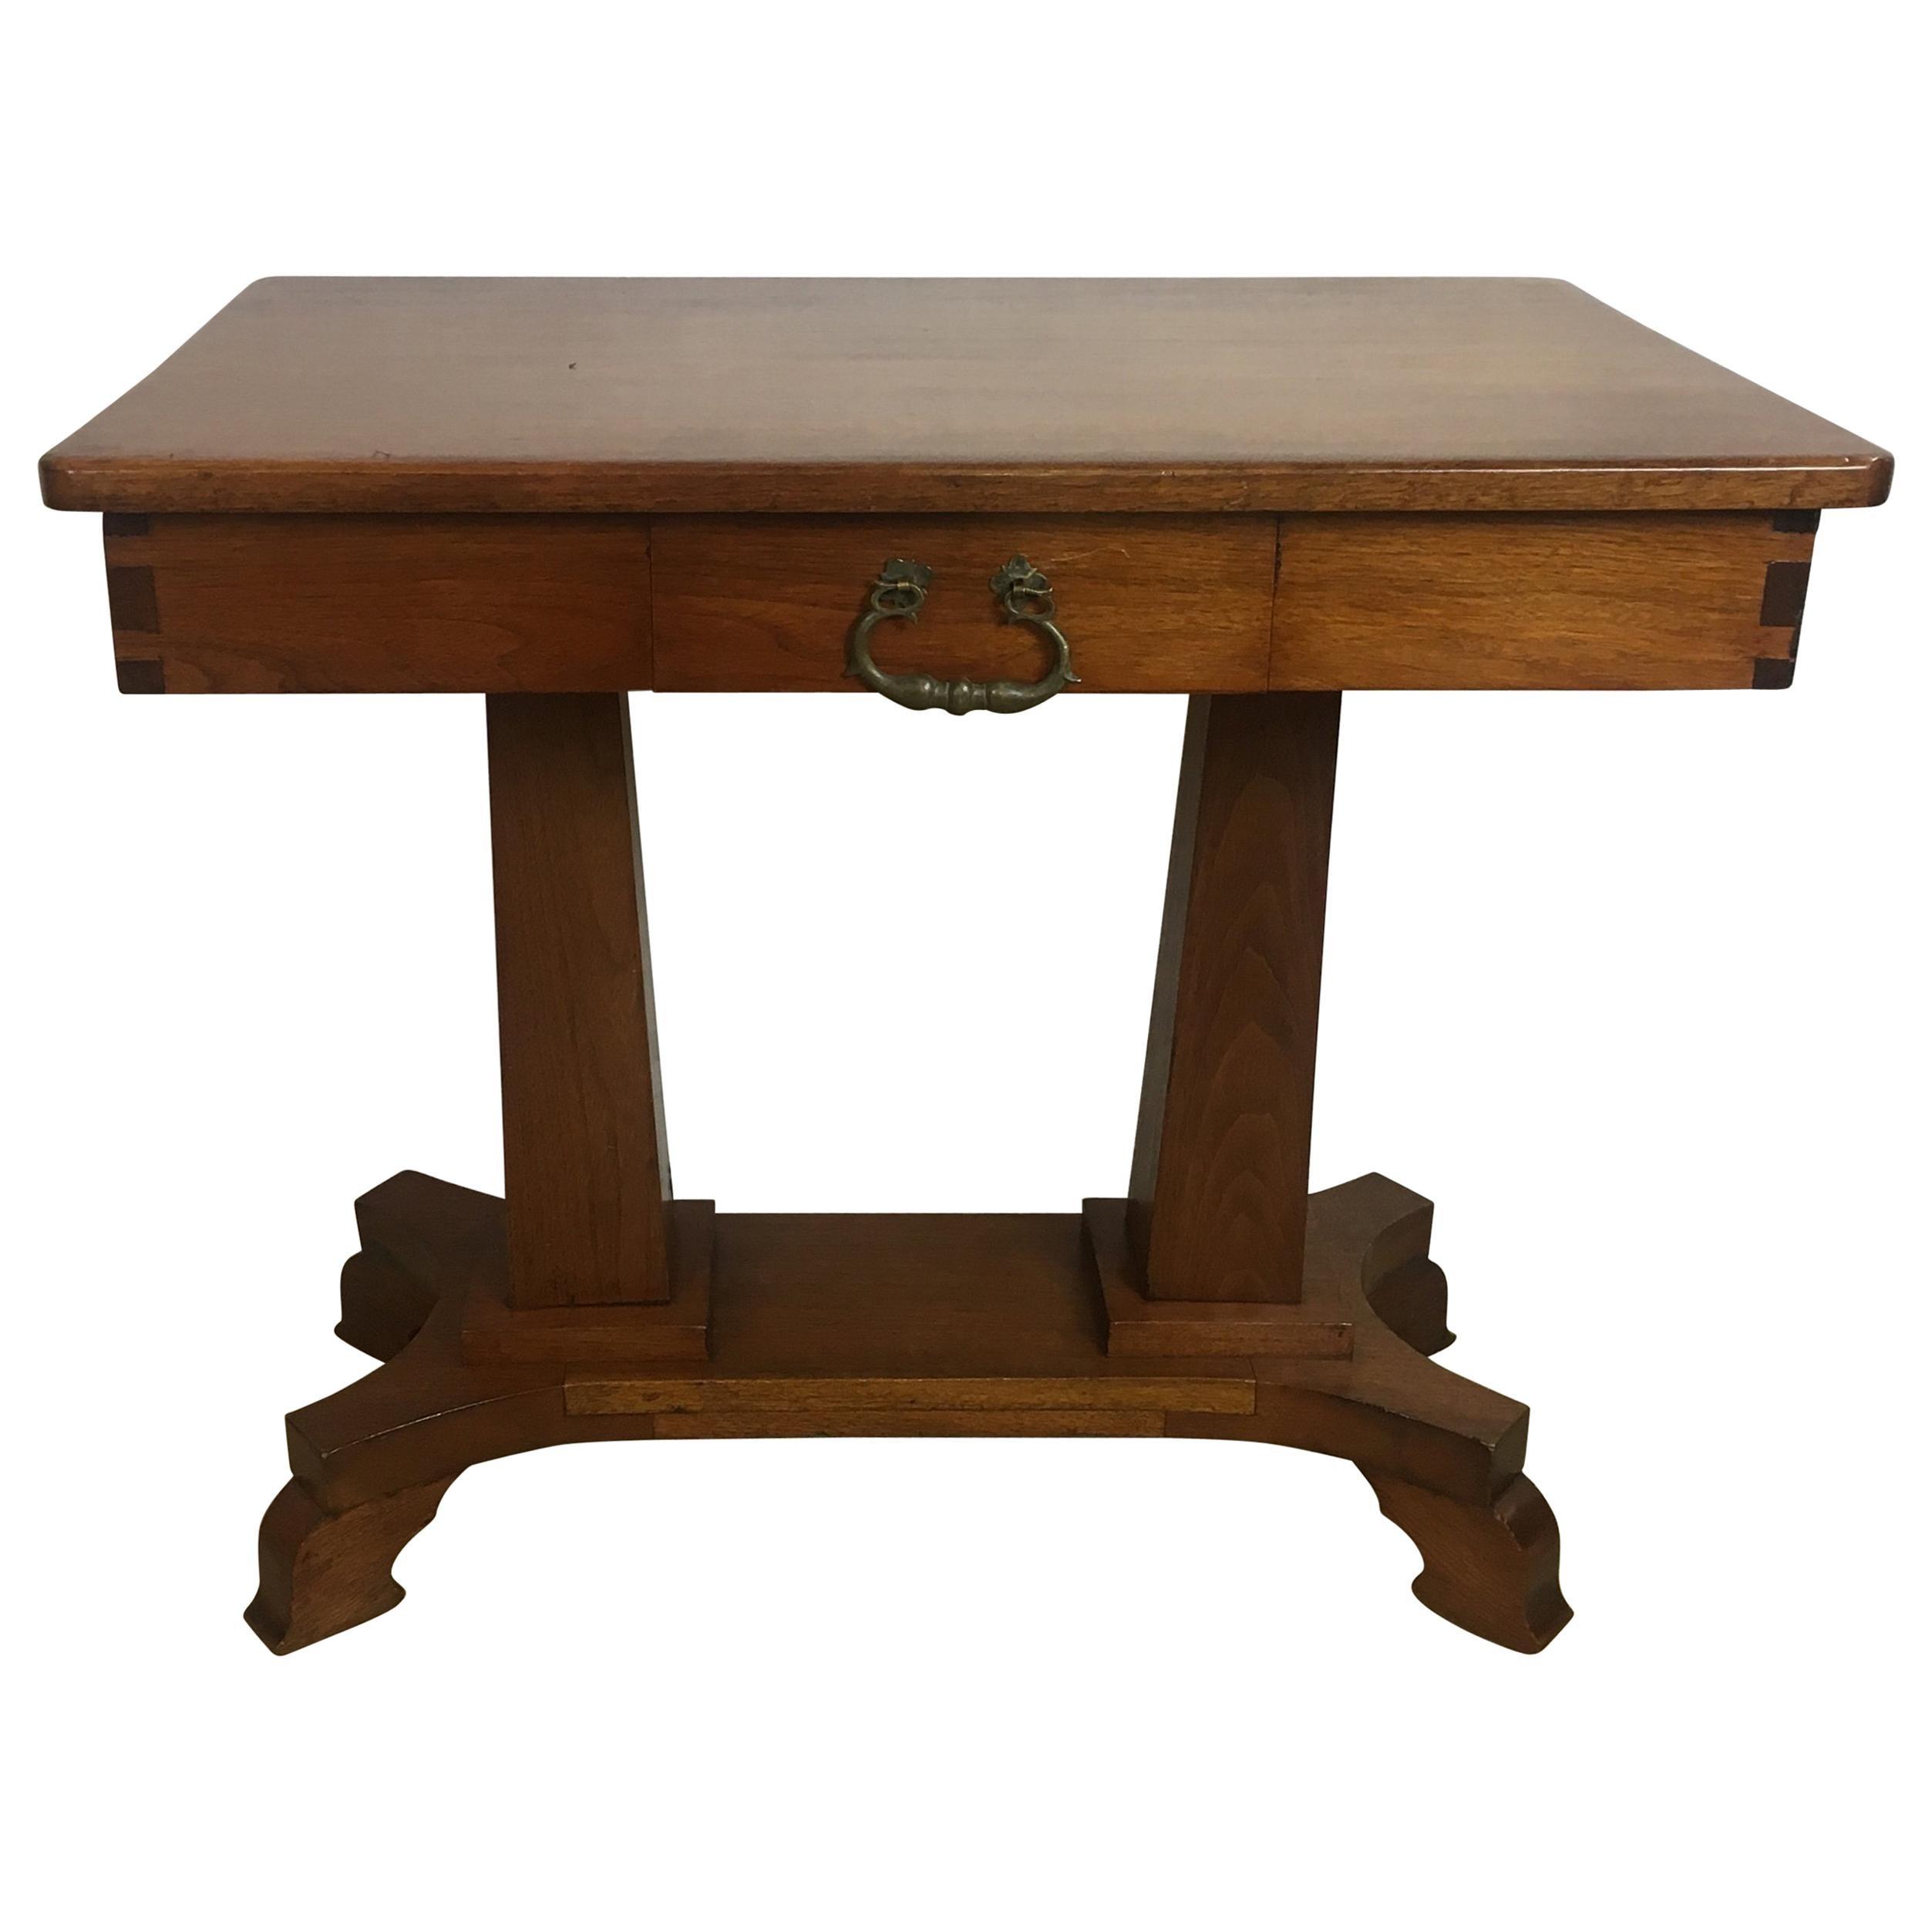 American Arts & Crafts Era Mahogany Side Table or Small Desk